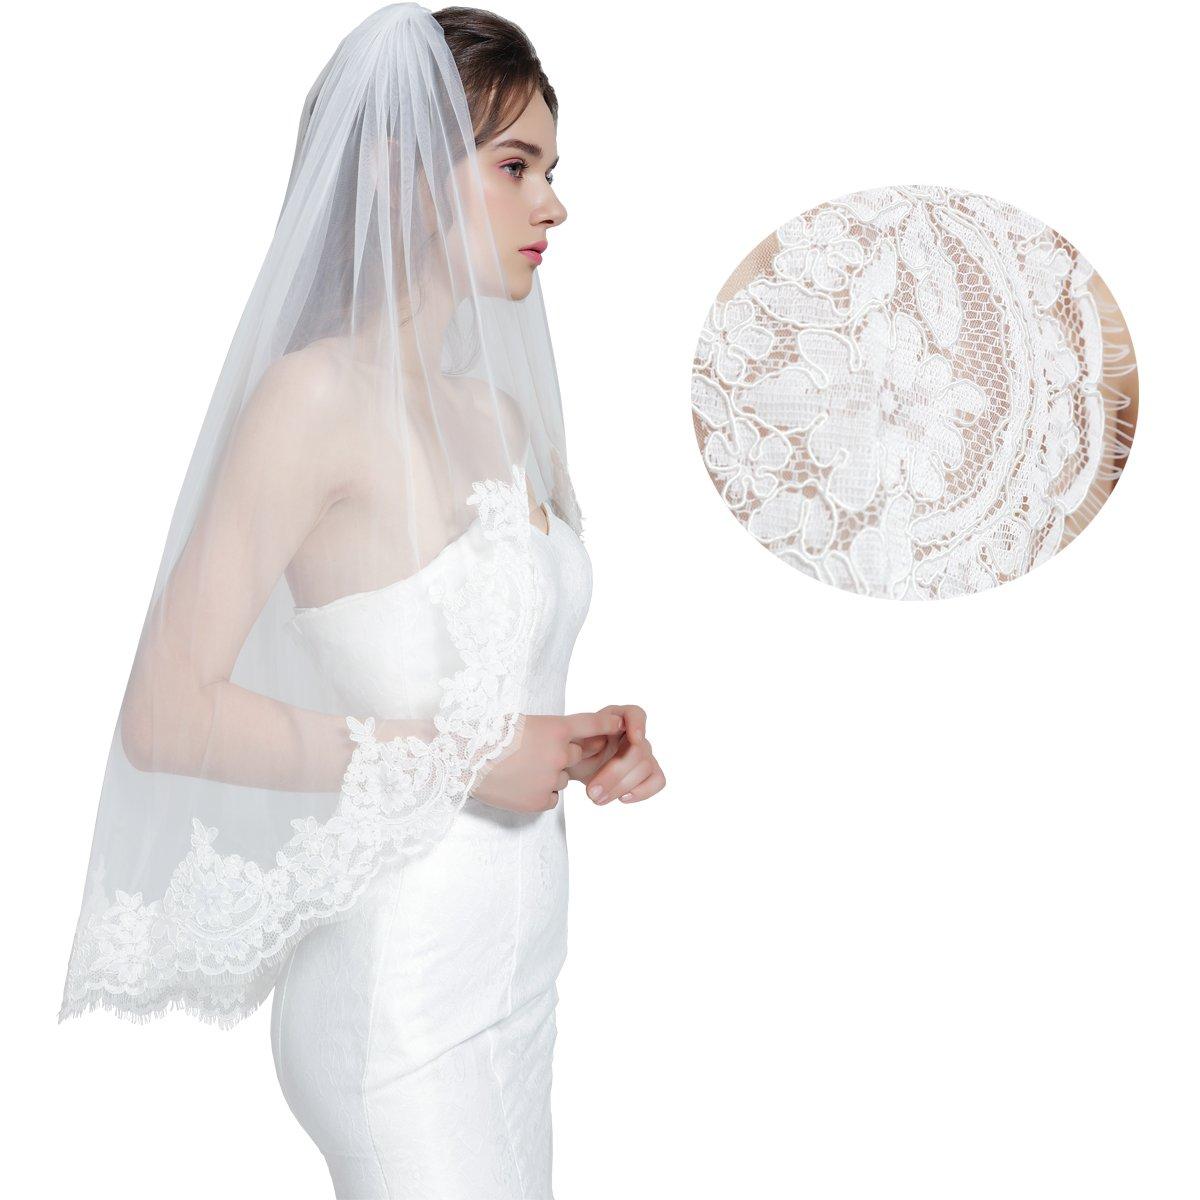 Wedding Bridal Veil with Comb 1 Tier Eyelash Lace Trim Applique Edge Fingertip Length 37'' Ivory